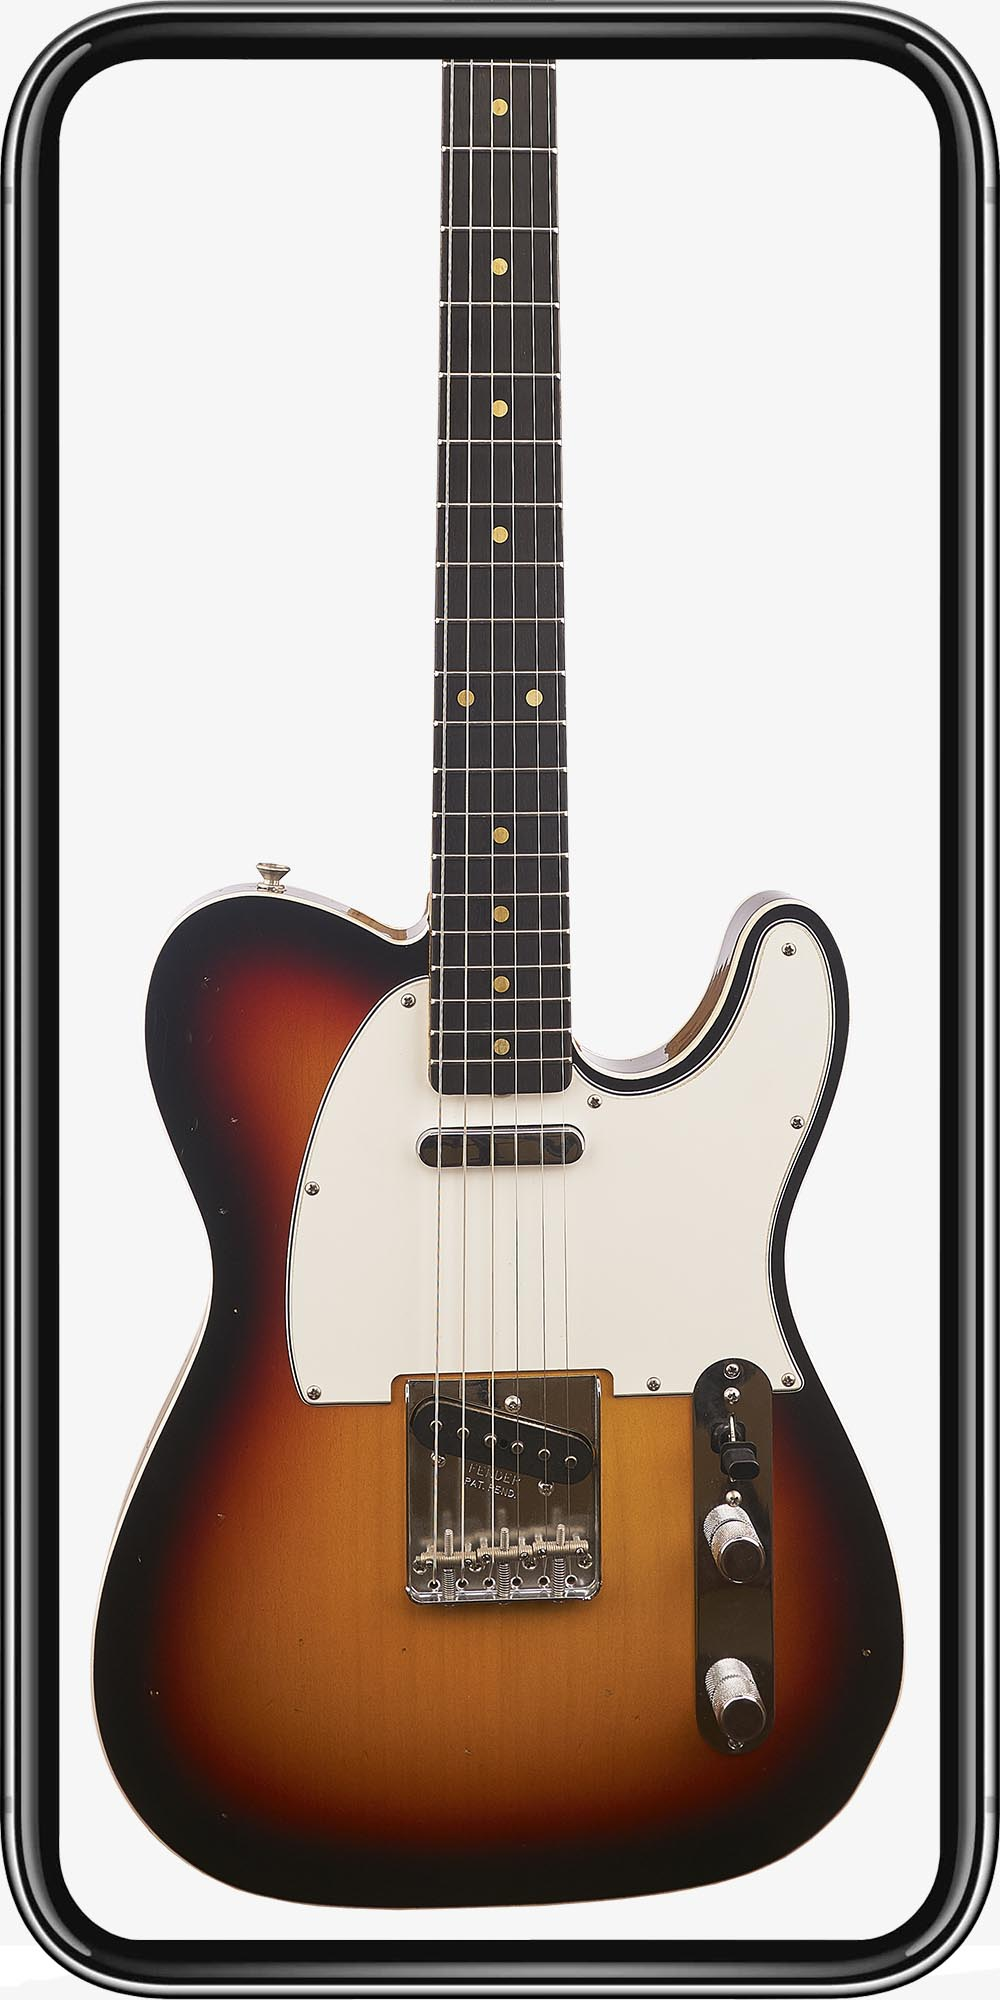 Fender Custom Shop Custom Order Telecaster Custom '60 RW Journeyman 3 Color Sunburst